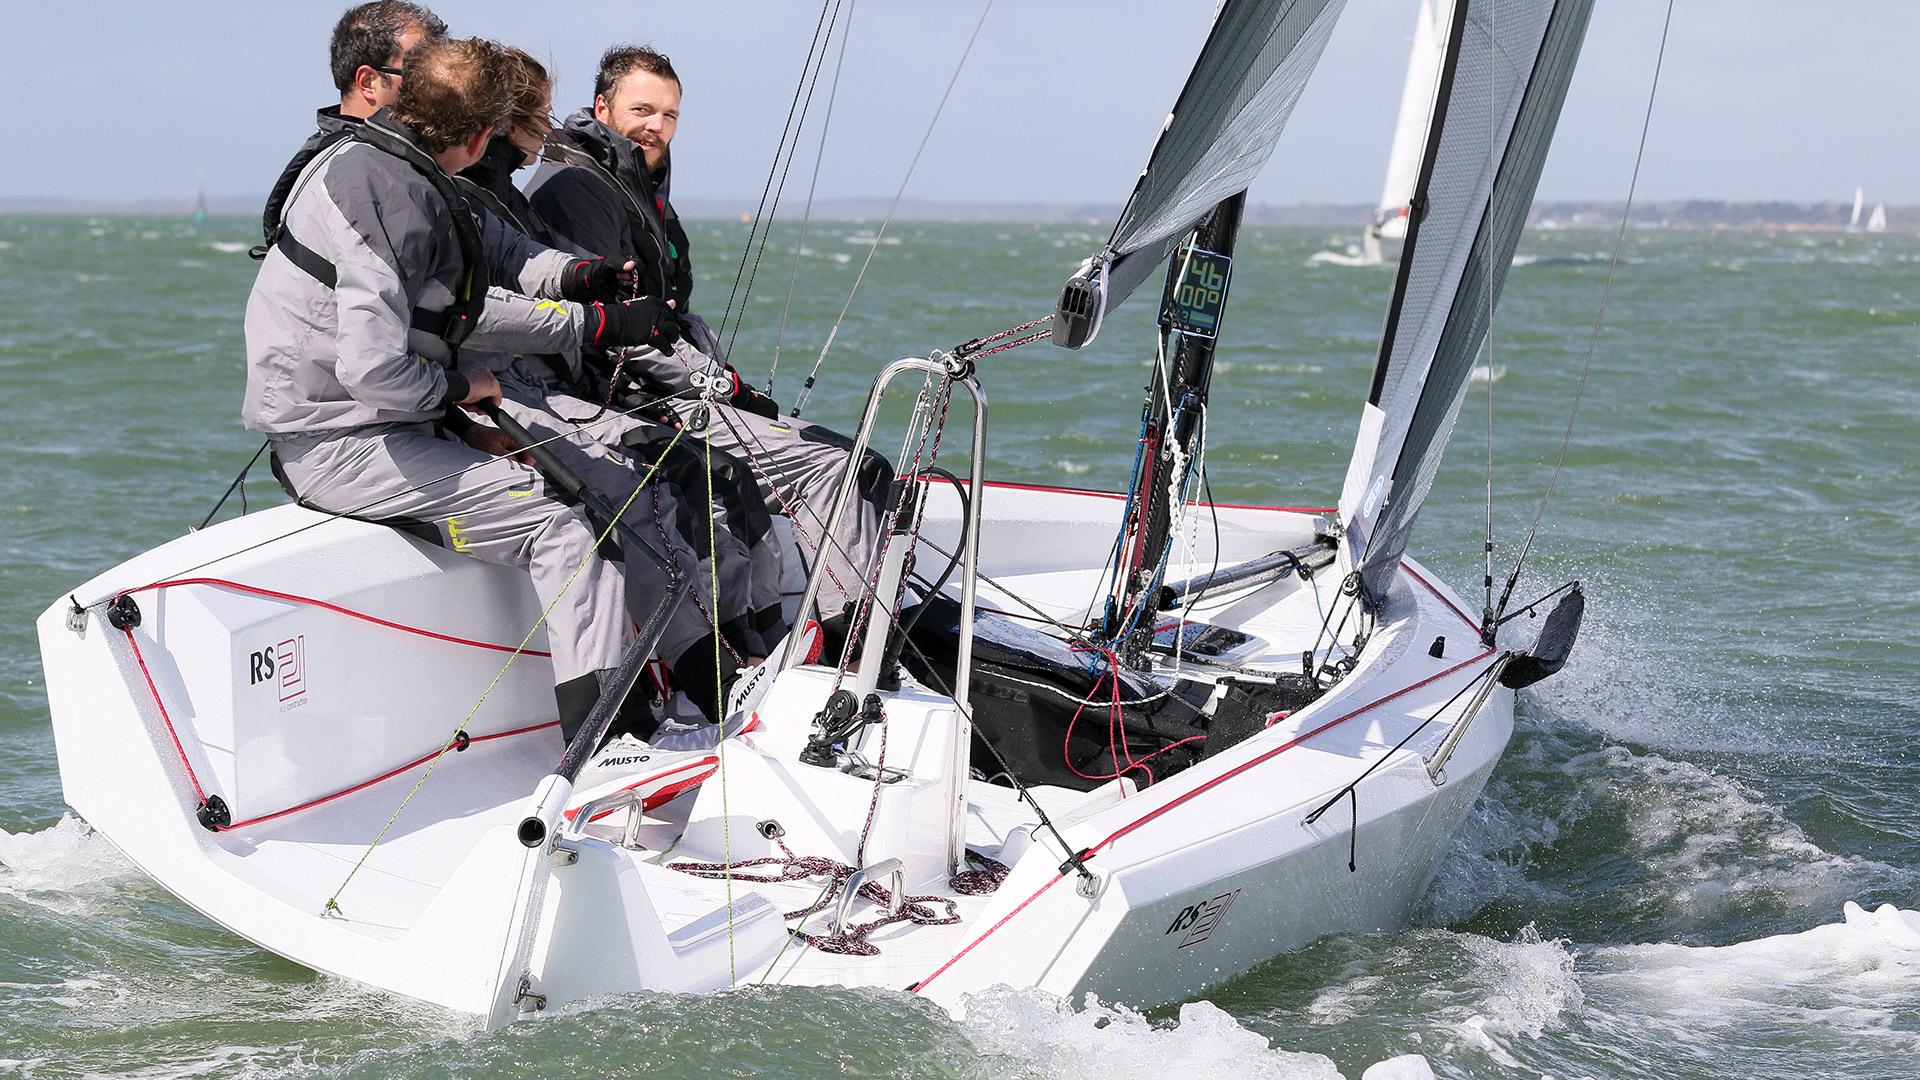 RS 21 Central Coast Sailing 12.jpg